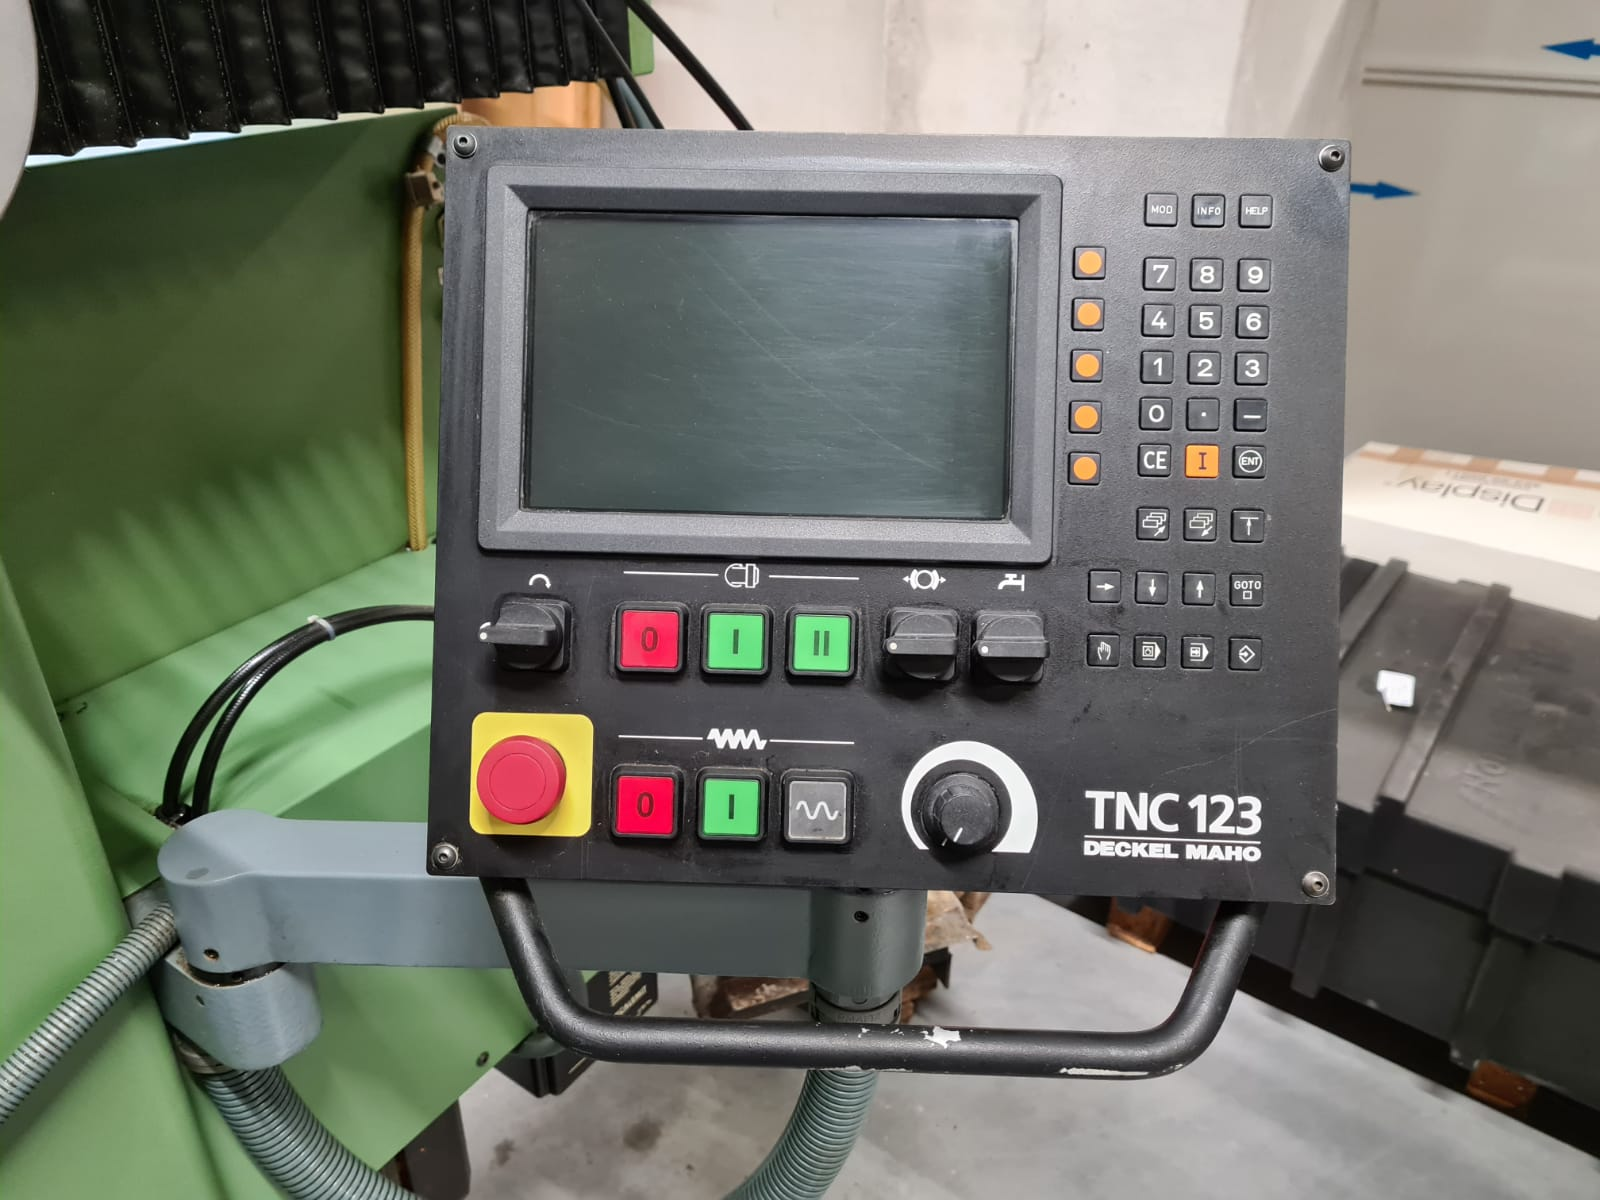 TNC 123